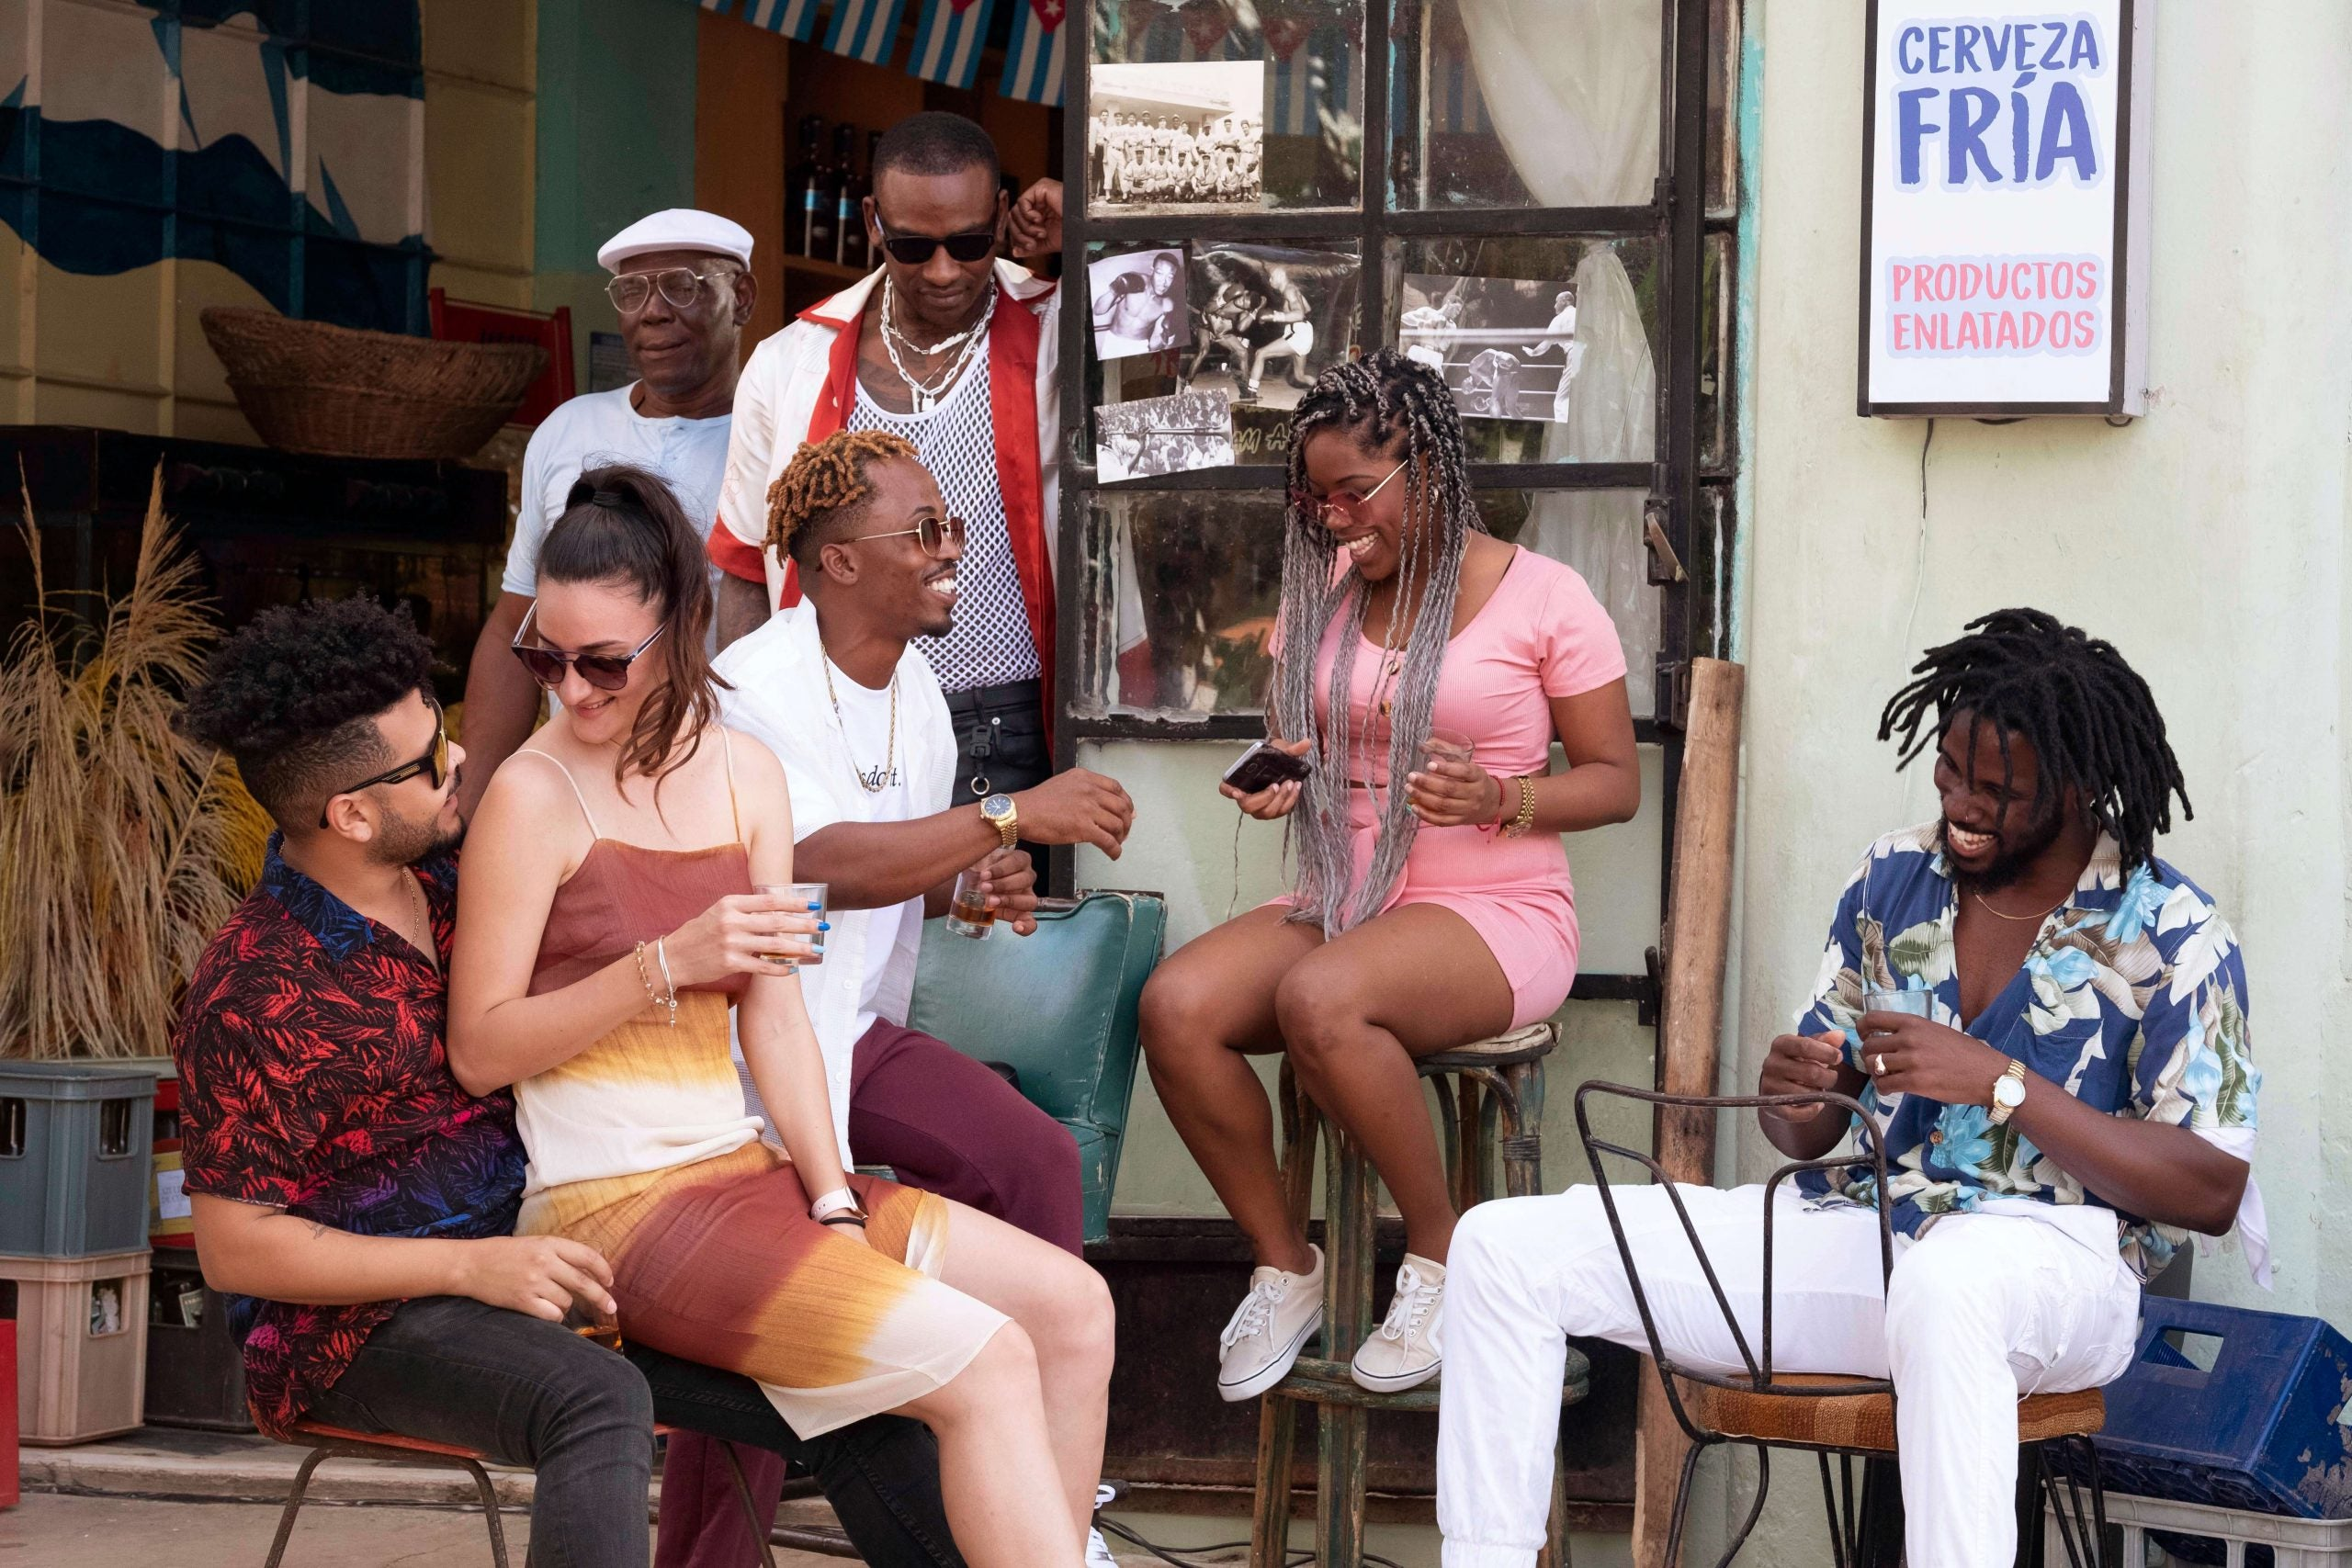 Collab Skepta x Havana Club